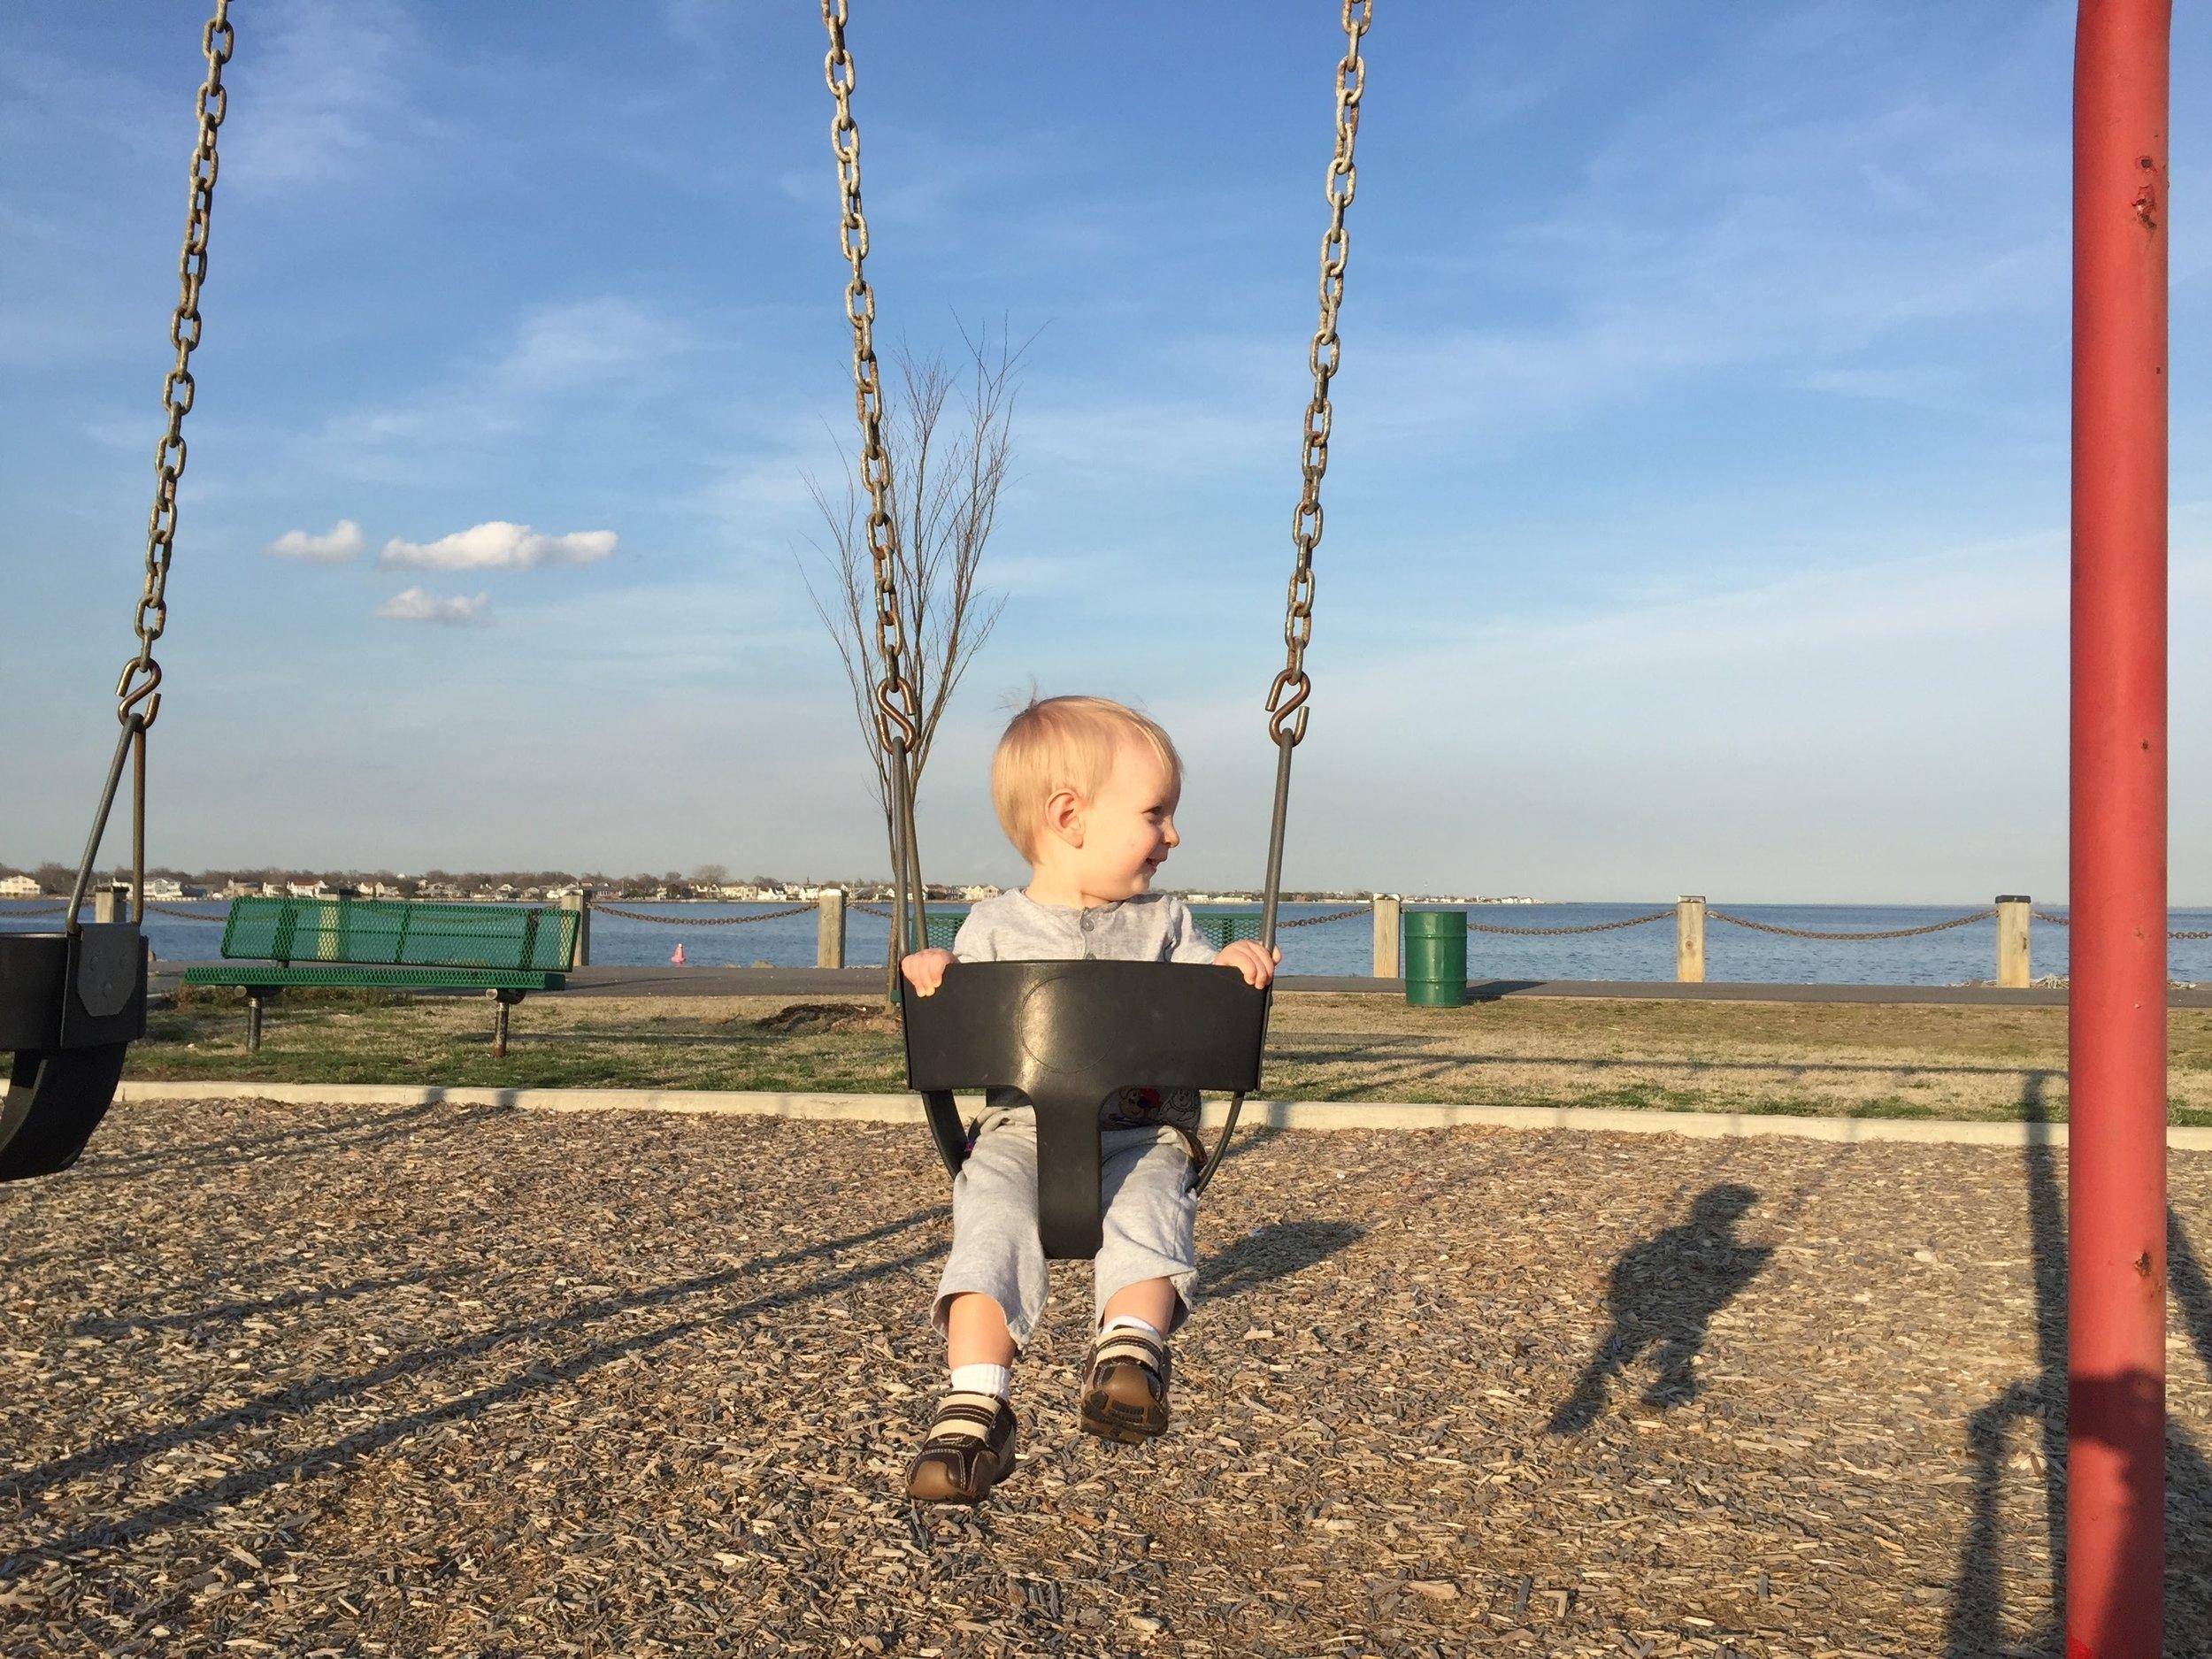 Swings at Nassau Shores Bayfront Park